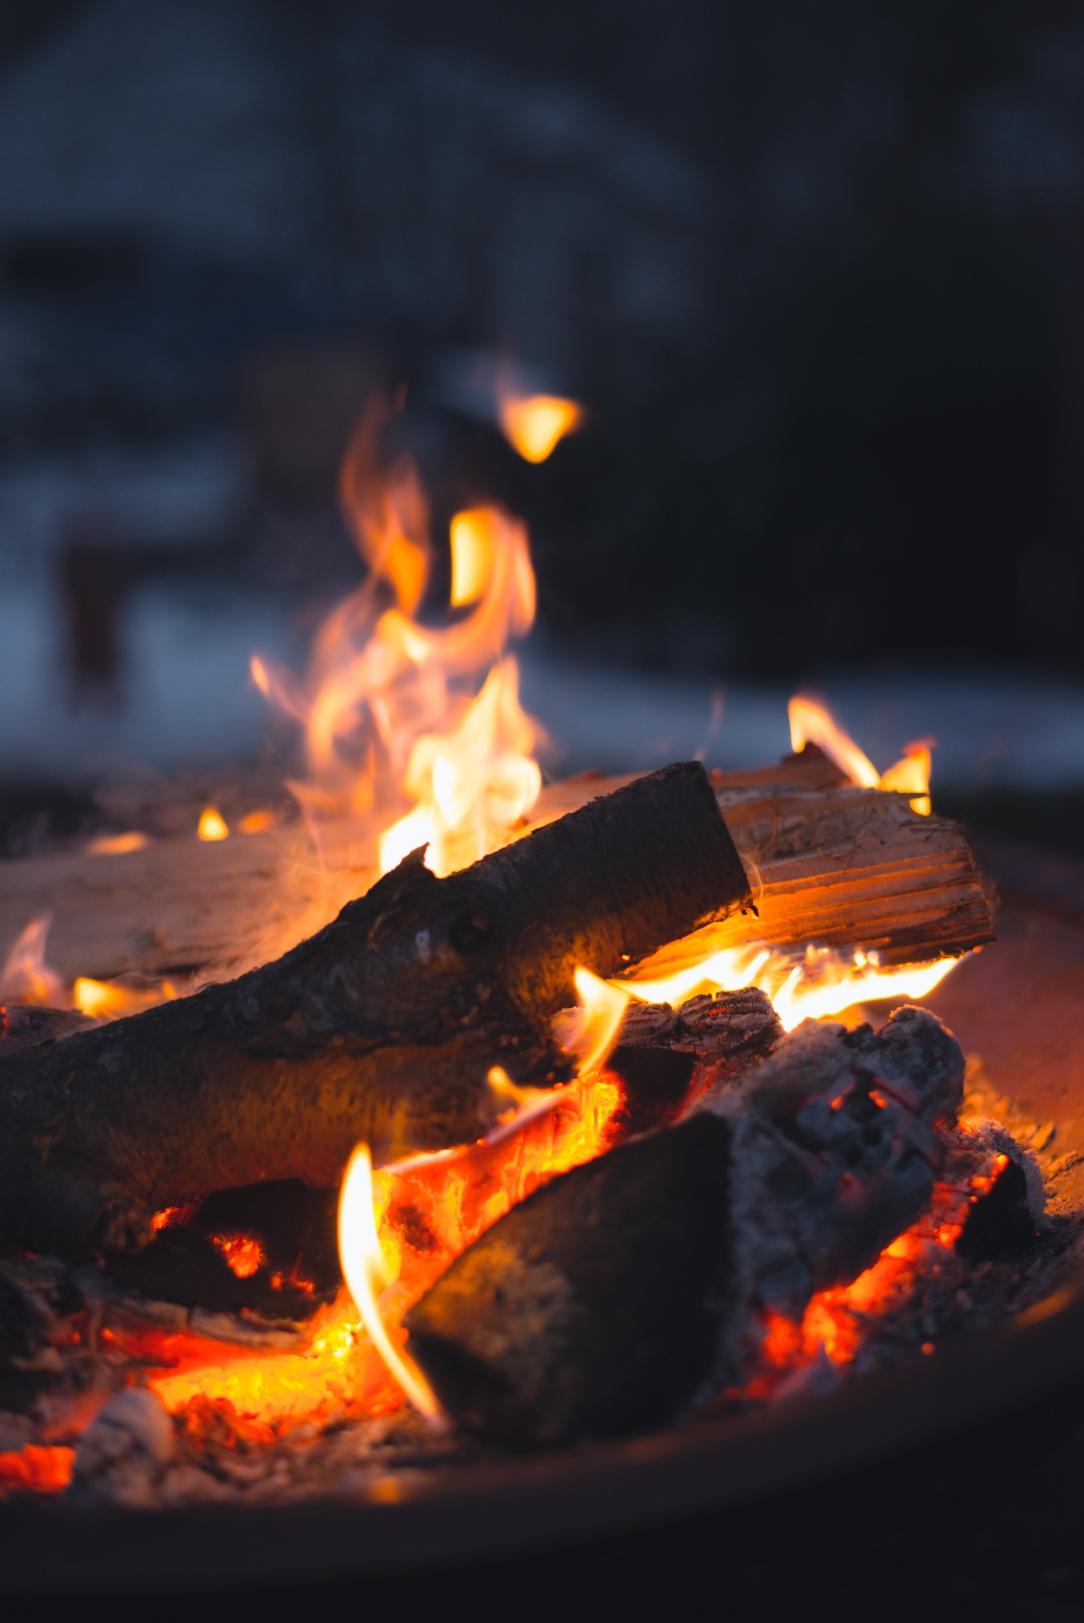 make-apple-cider-new-england-campfire-winter-5400